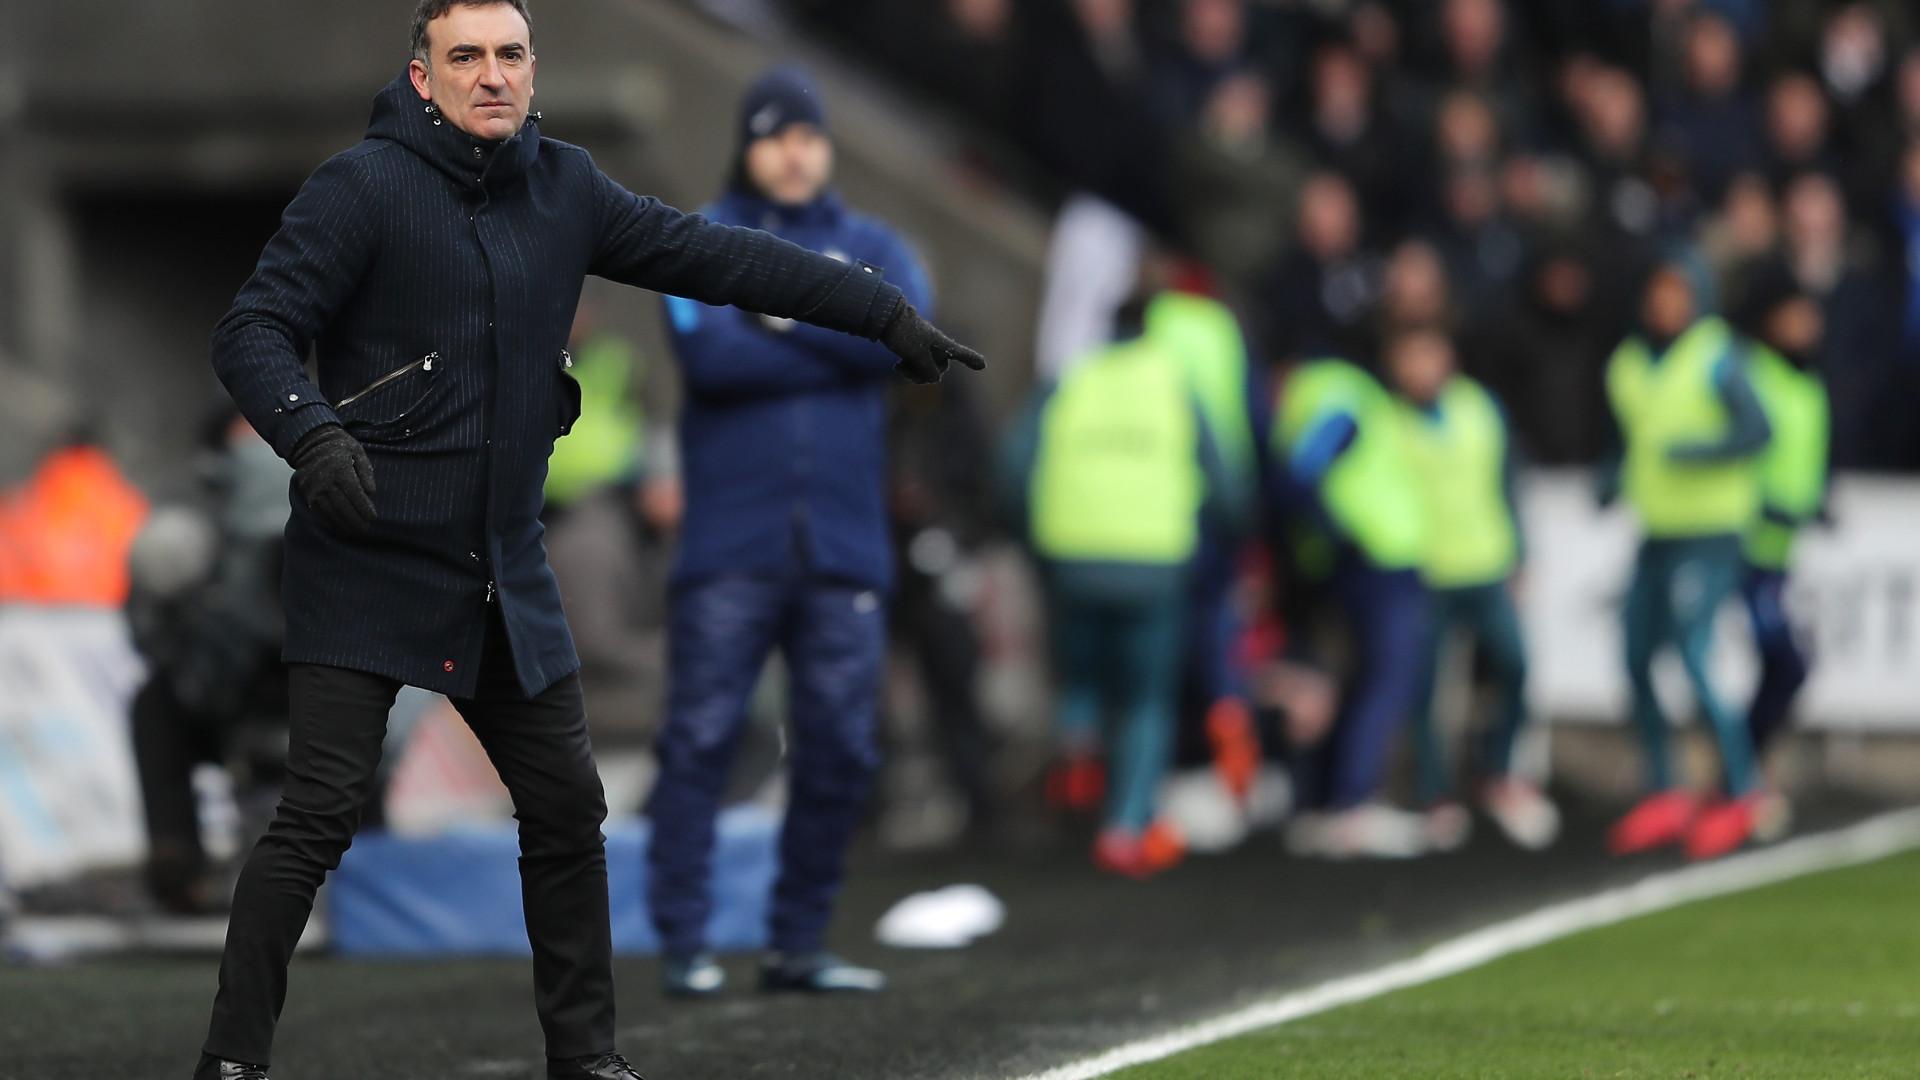 Veja o gol de Swansea 0x1 Chelsea